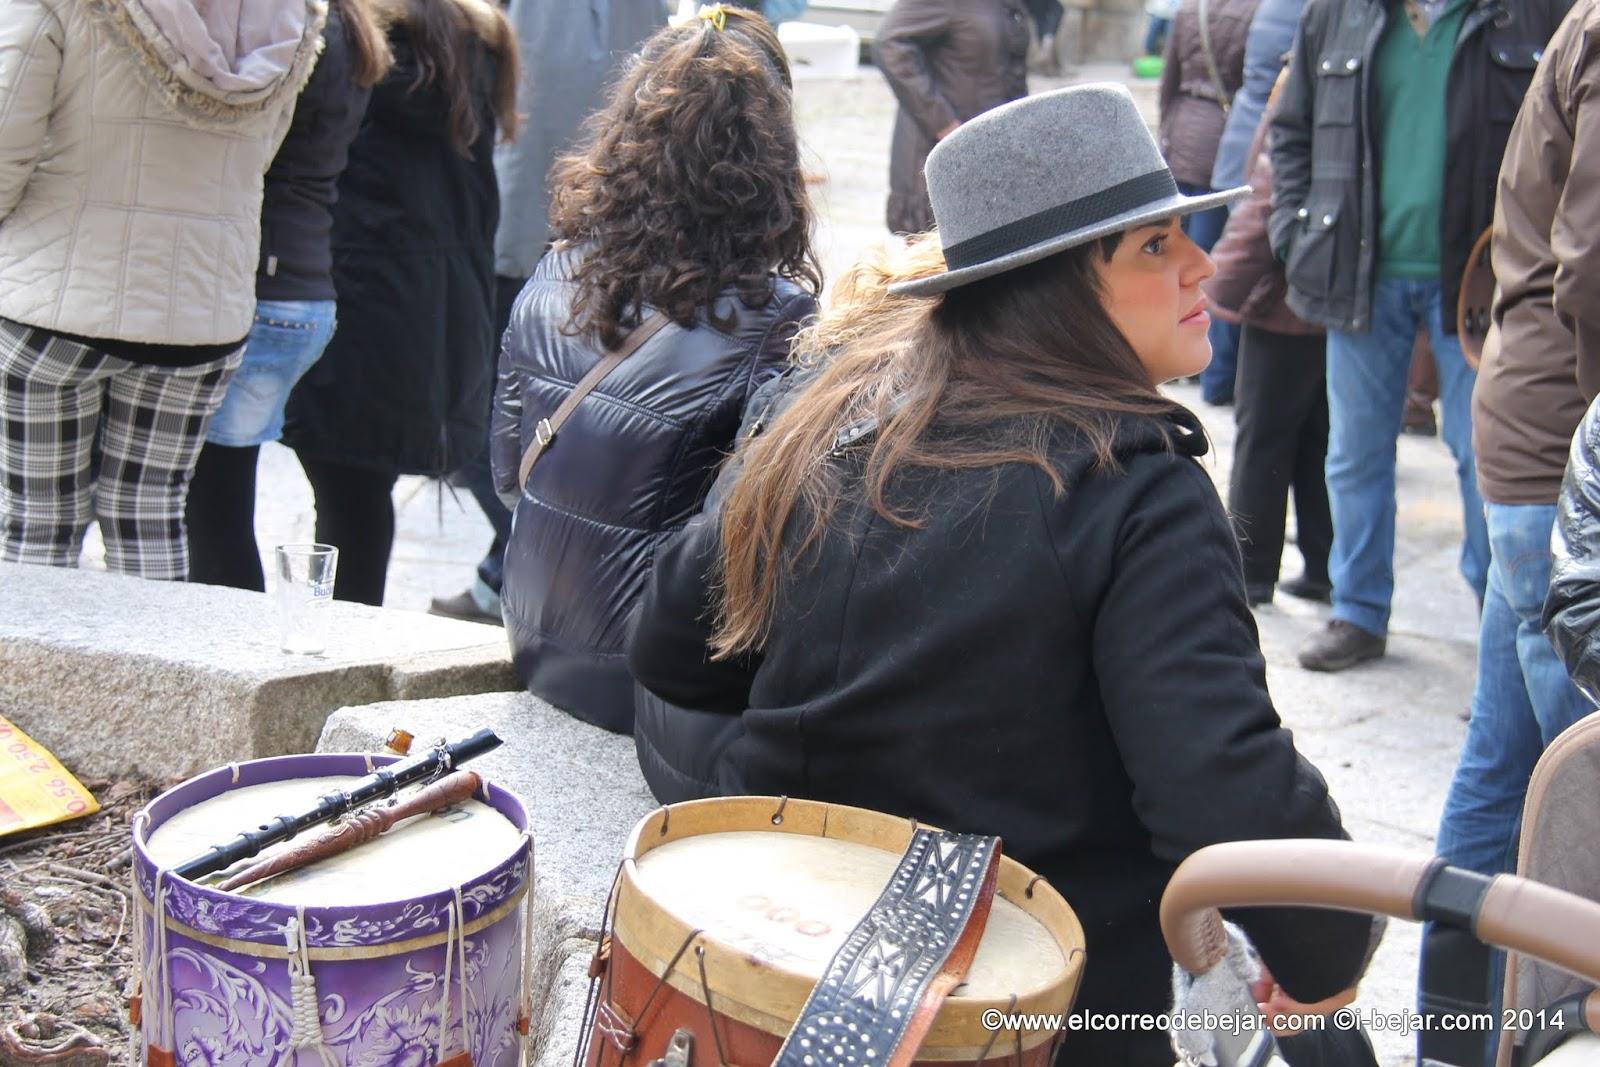 SAN BLAS MOGARRAZ ASISTENTES A LA FIESTA